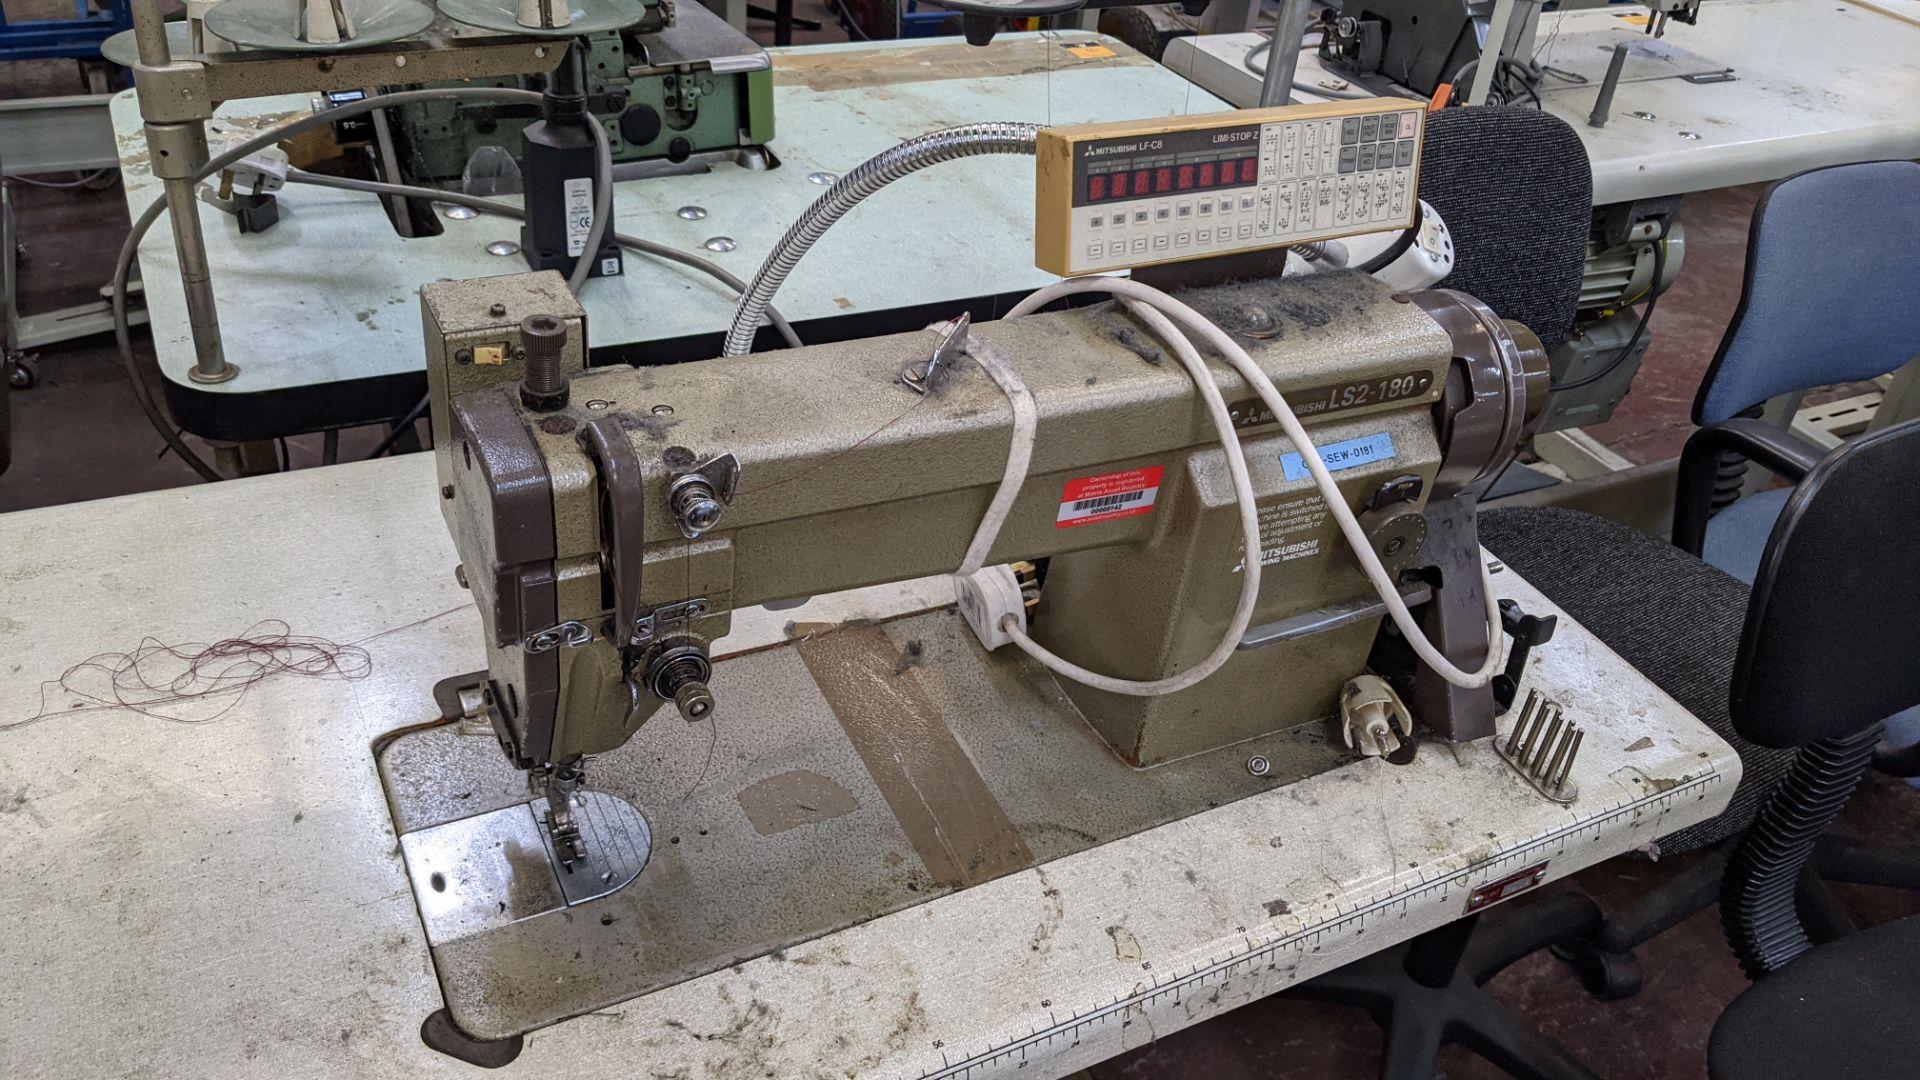 Mitsubishi LS2-180 sewing machine with Mitsubishi LF-C8 digital controller - Image 6 of 12